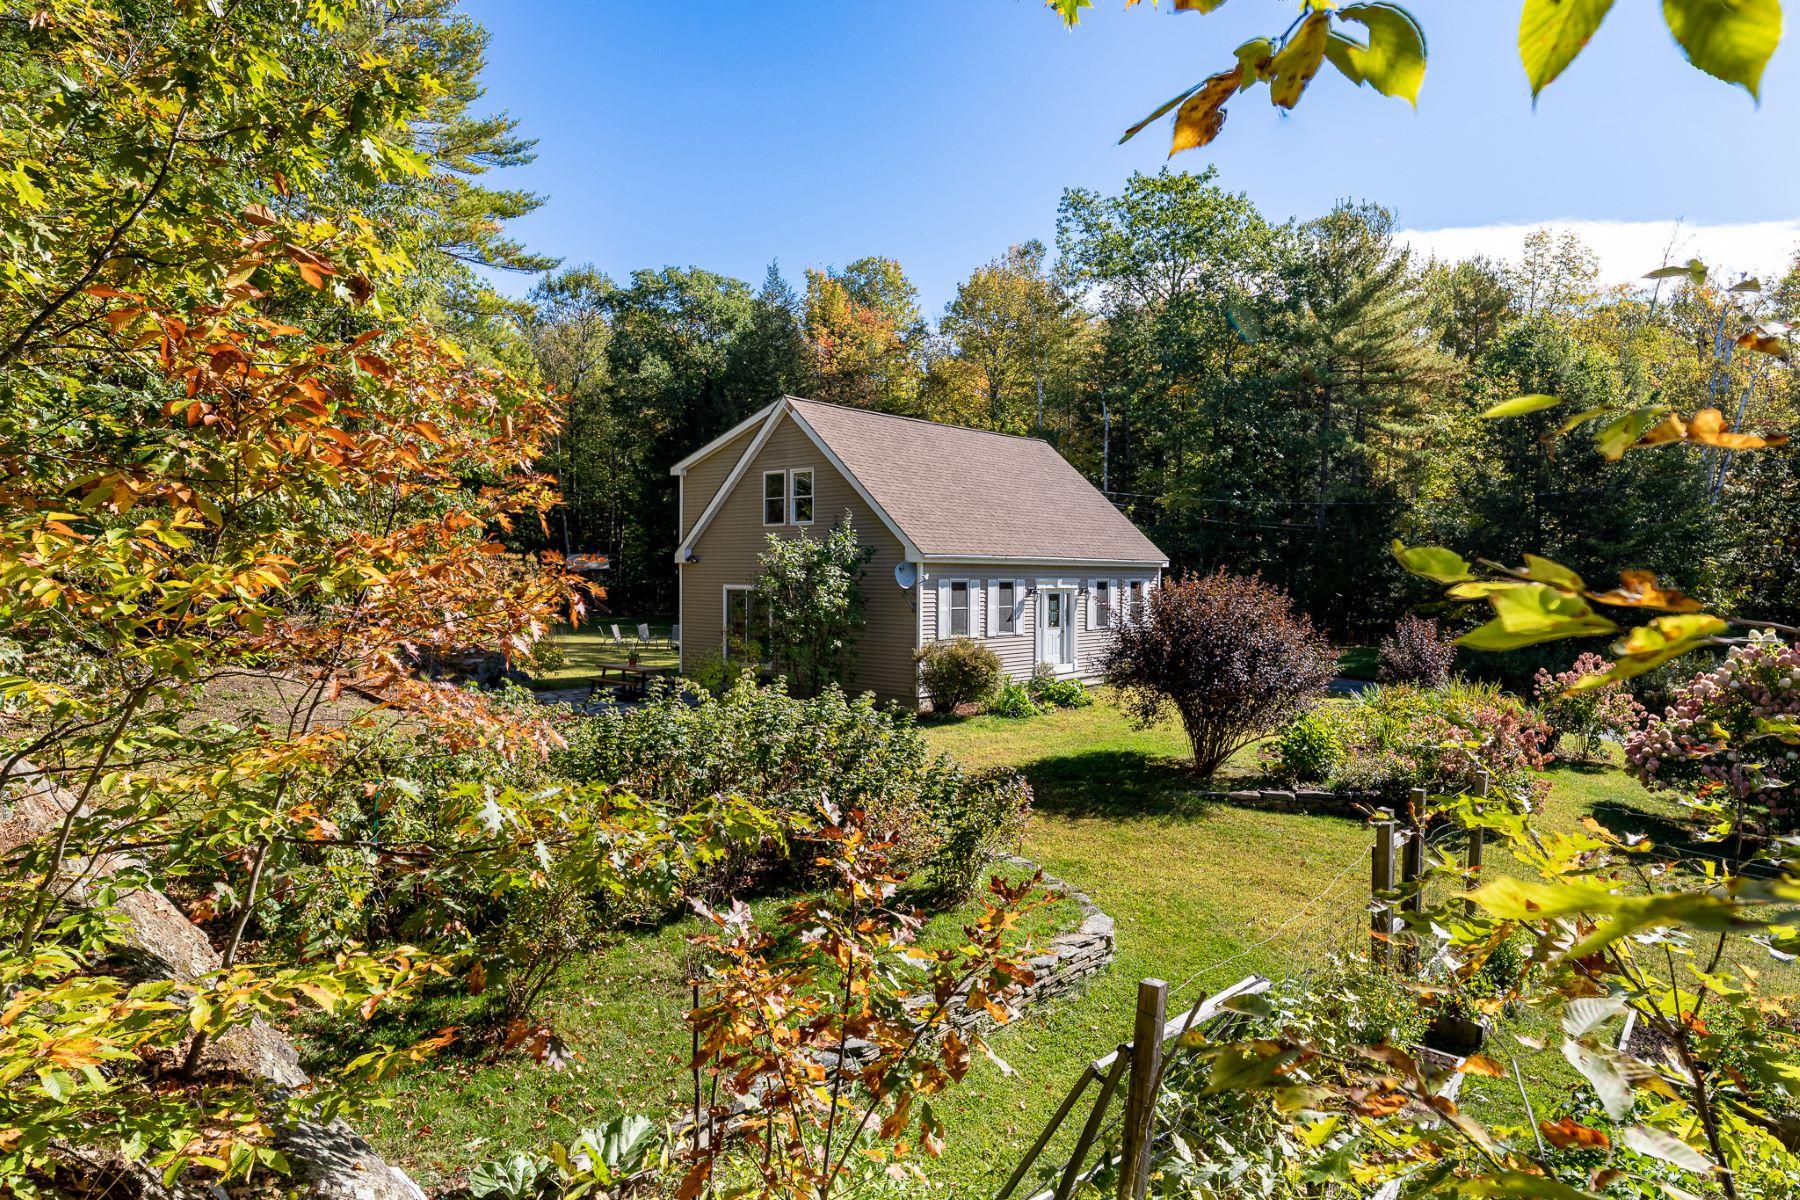 Single Family Homes for Sale at 158 Deer Run Lane, Thetford 158 Deer Run Ln Thetford, Vermont 05043 United States